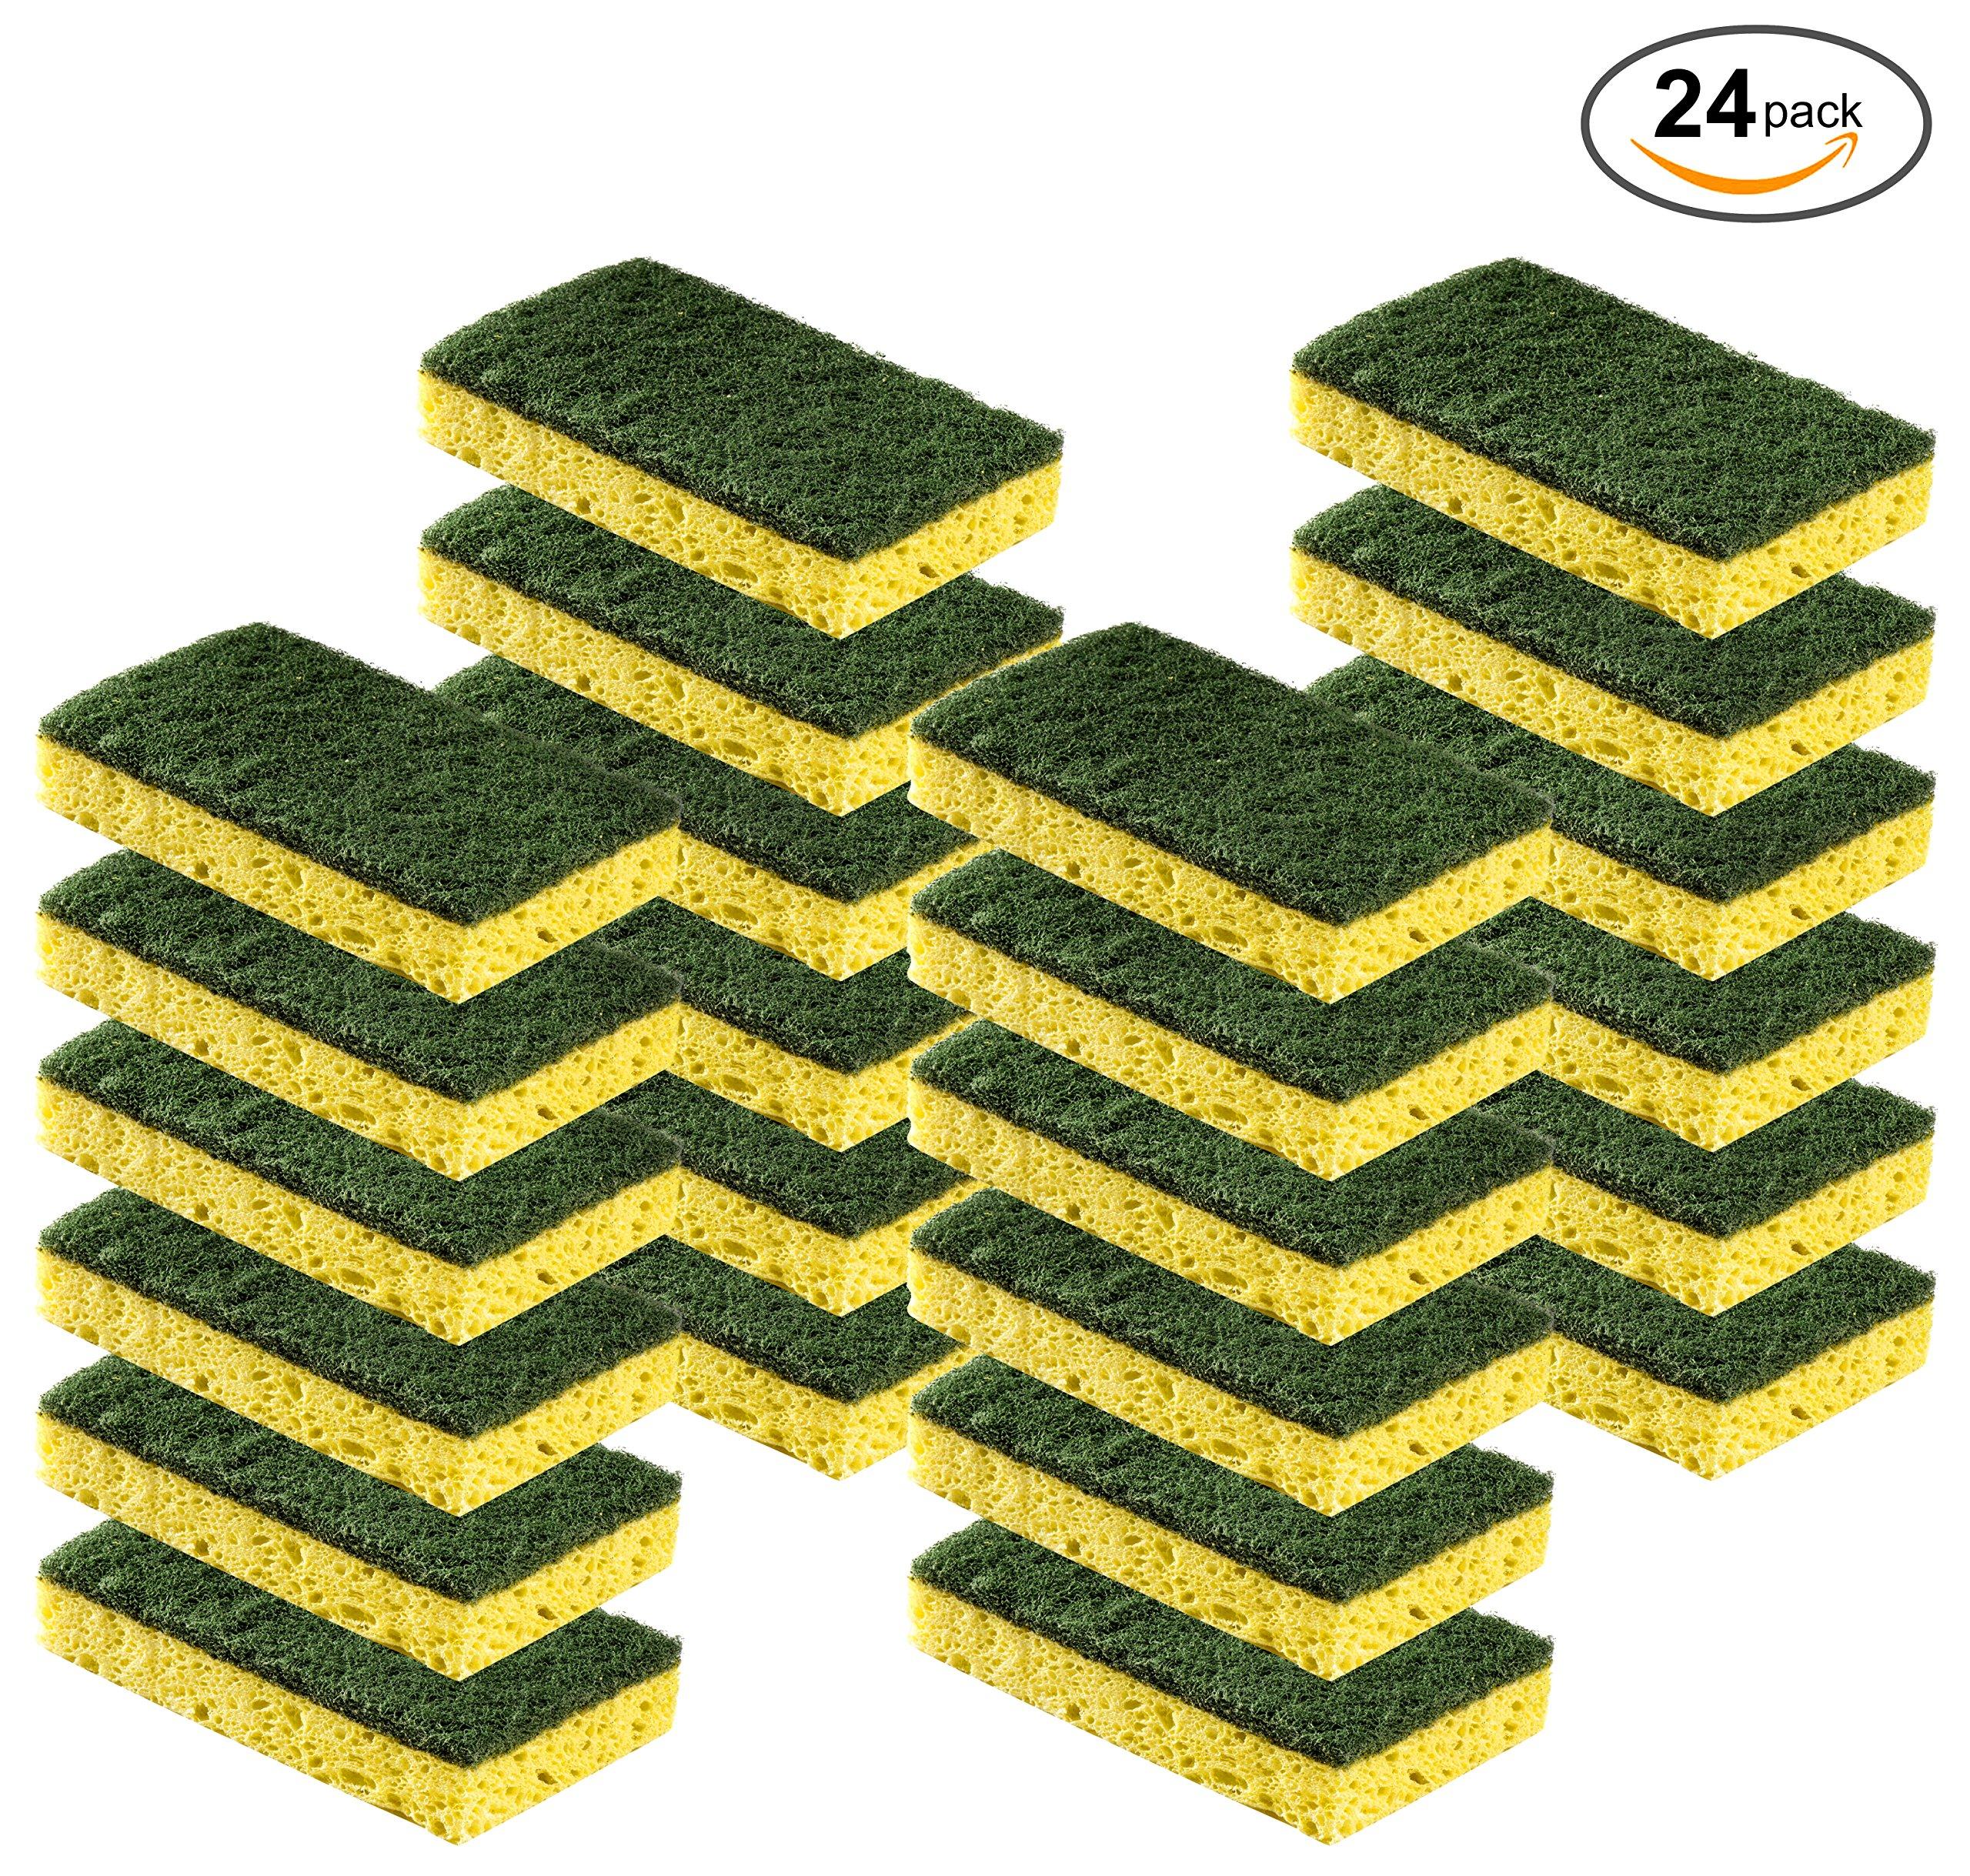 Cleaning Heavy Duty Scrub sponge by Scrub-it – Non-Scratch – Scrubbing Sponges Use for Kitchen, Bathroom & More – Yellow -24 Pack- A1kTBU9O96L